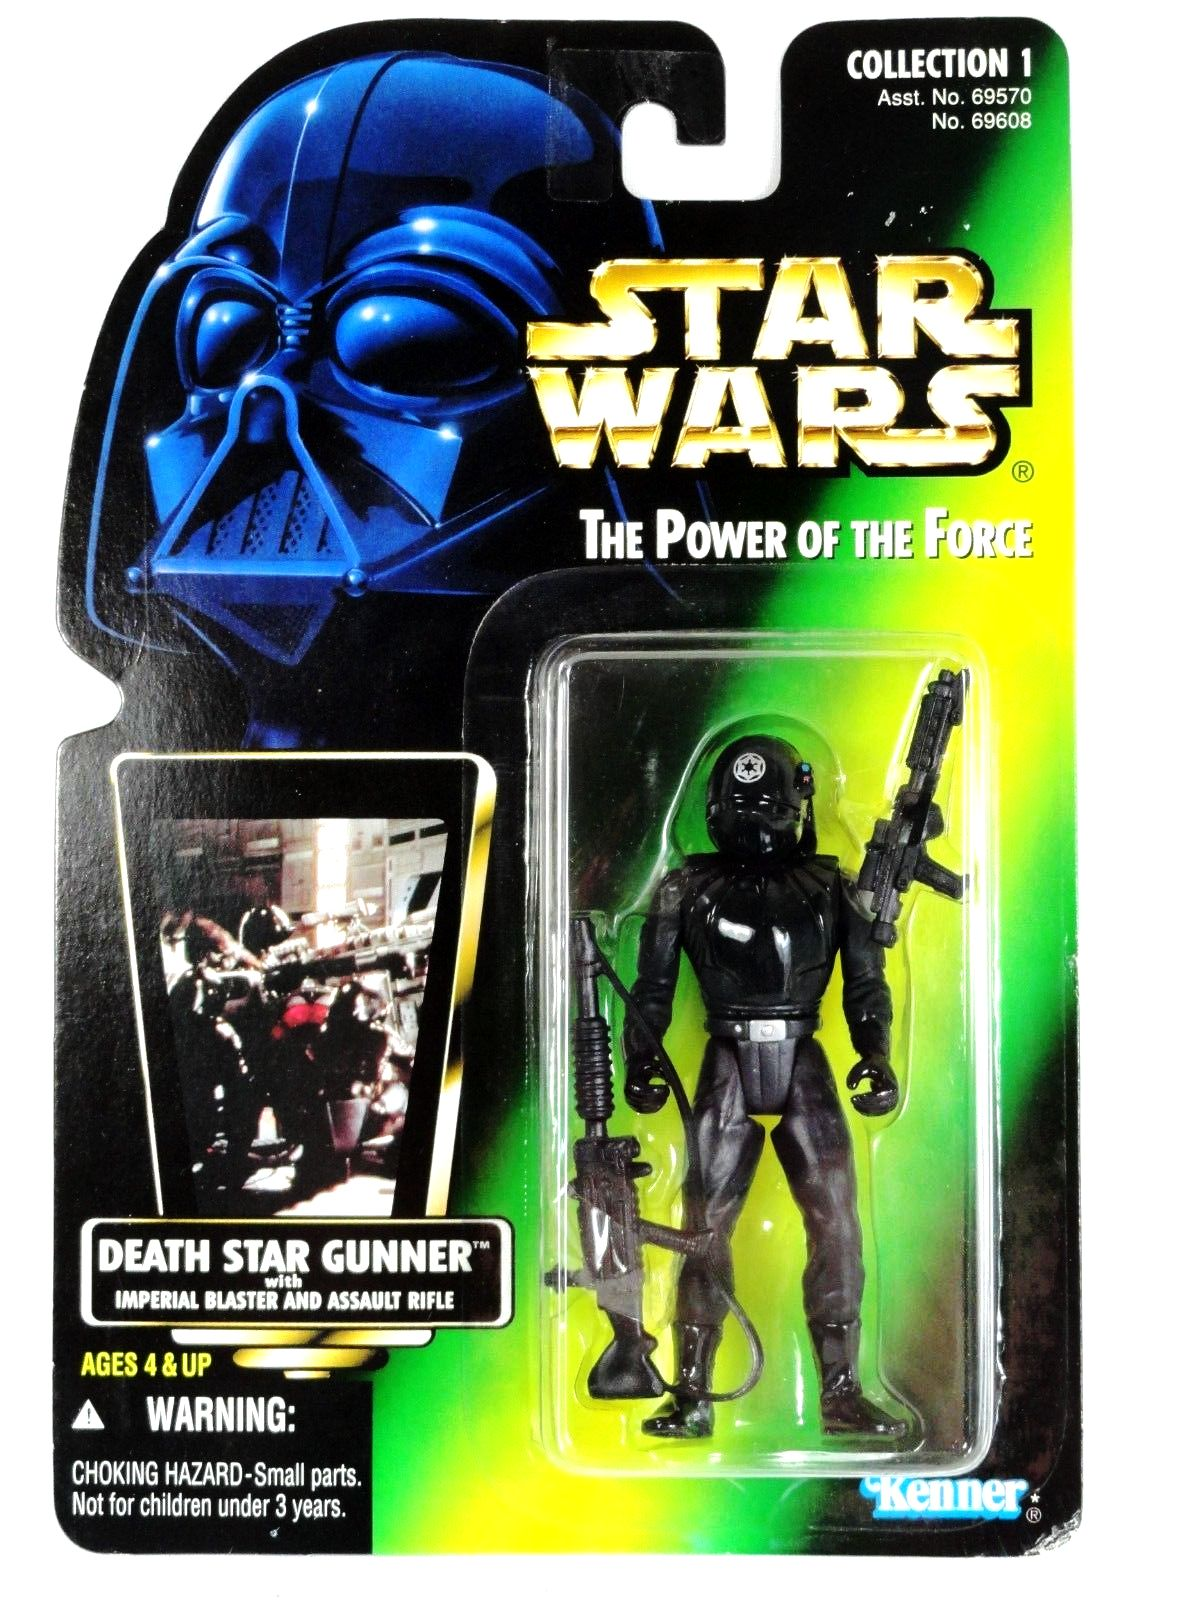 Star Wars The Power Of The Force Death Star Gunner Kenner Hologram Figure